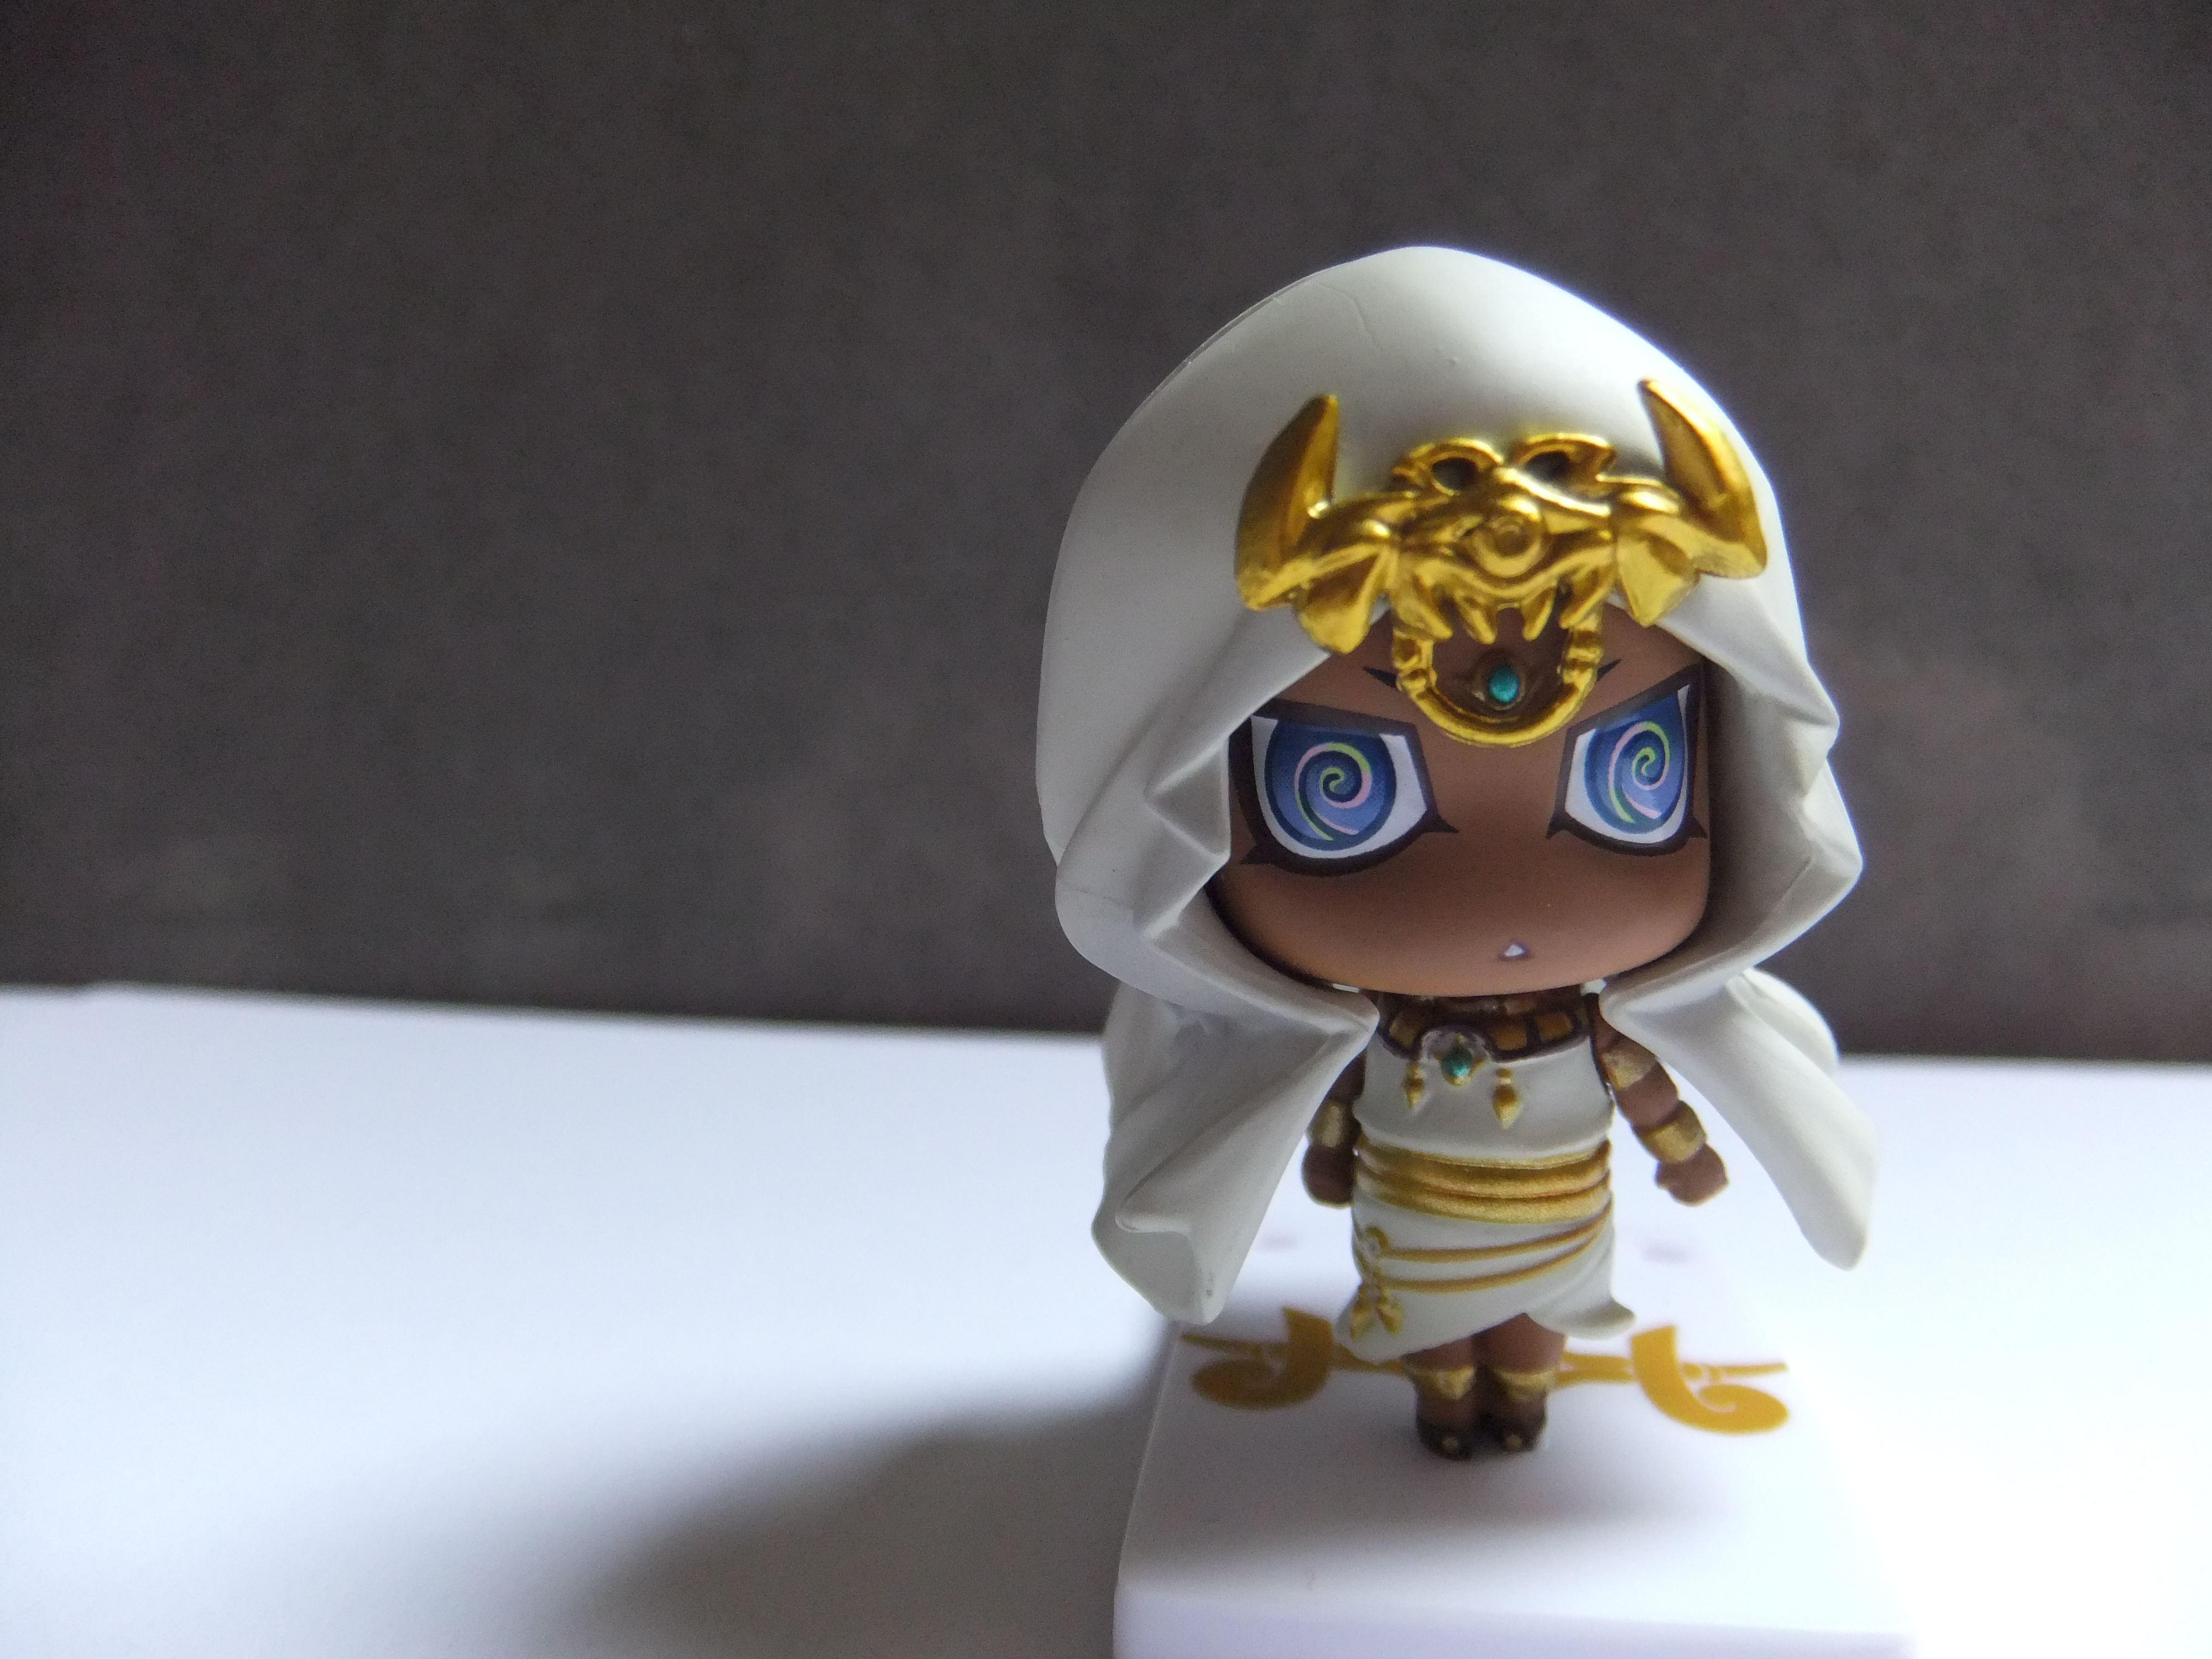 kotobukiya yu-gi-oh! yu-gi-oh!_duel_masters_one_coin_grande_vol._2_~ancient_duel~ ishizu_ishtar